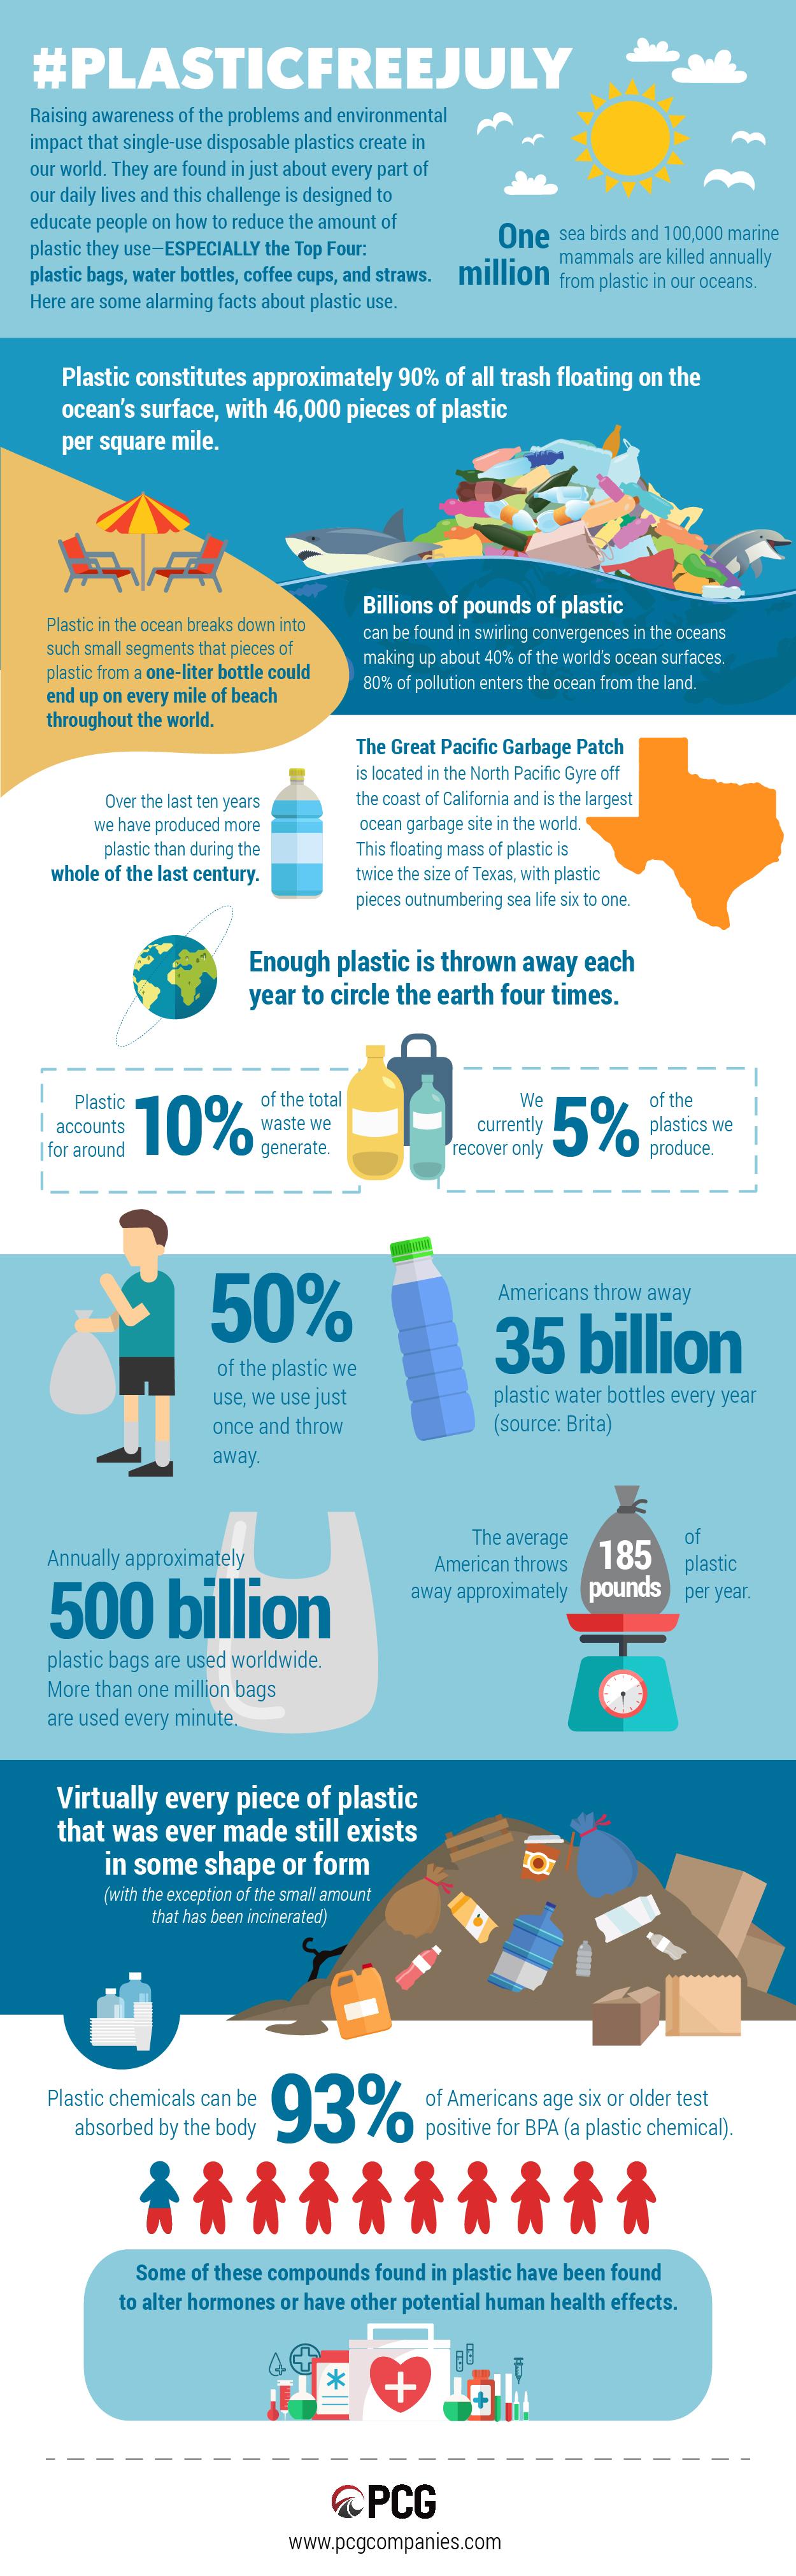 Plastic Free July | ecogreenlove